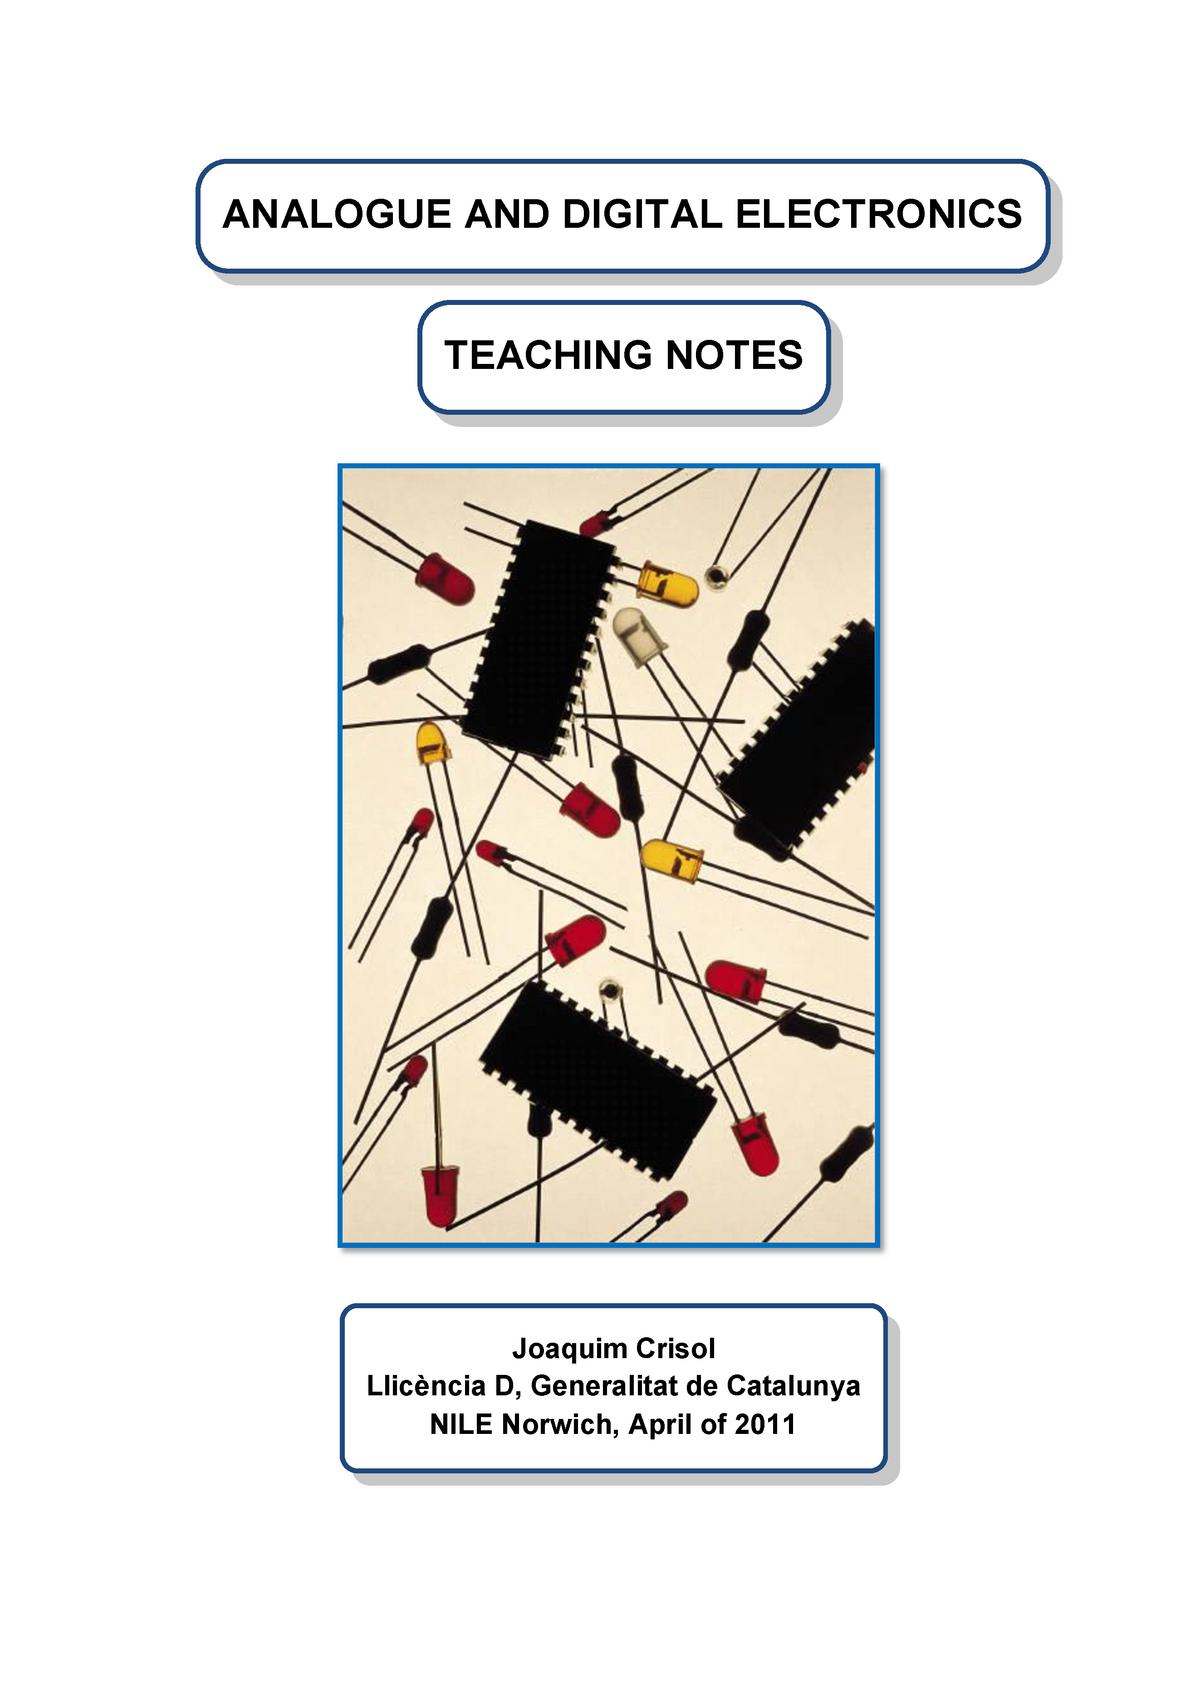 Teaching notes - Joaquin crisol - 5001: Physics - StuDocu